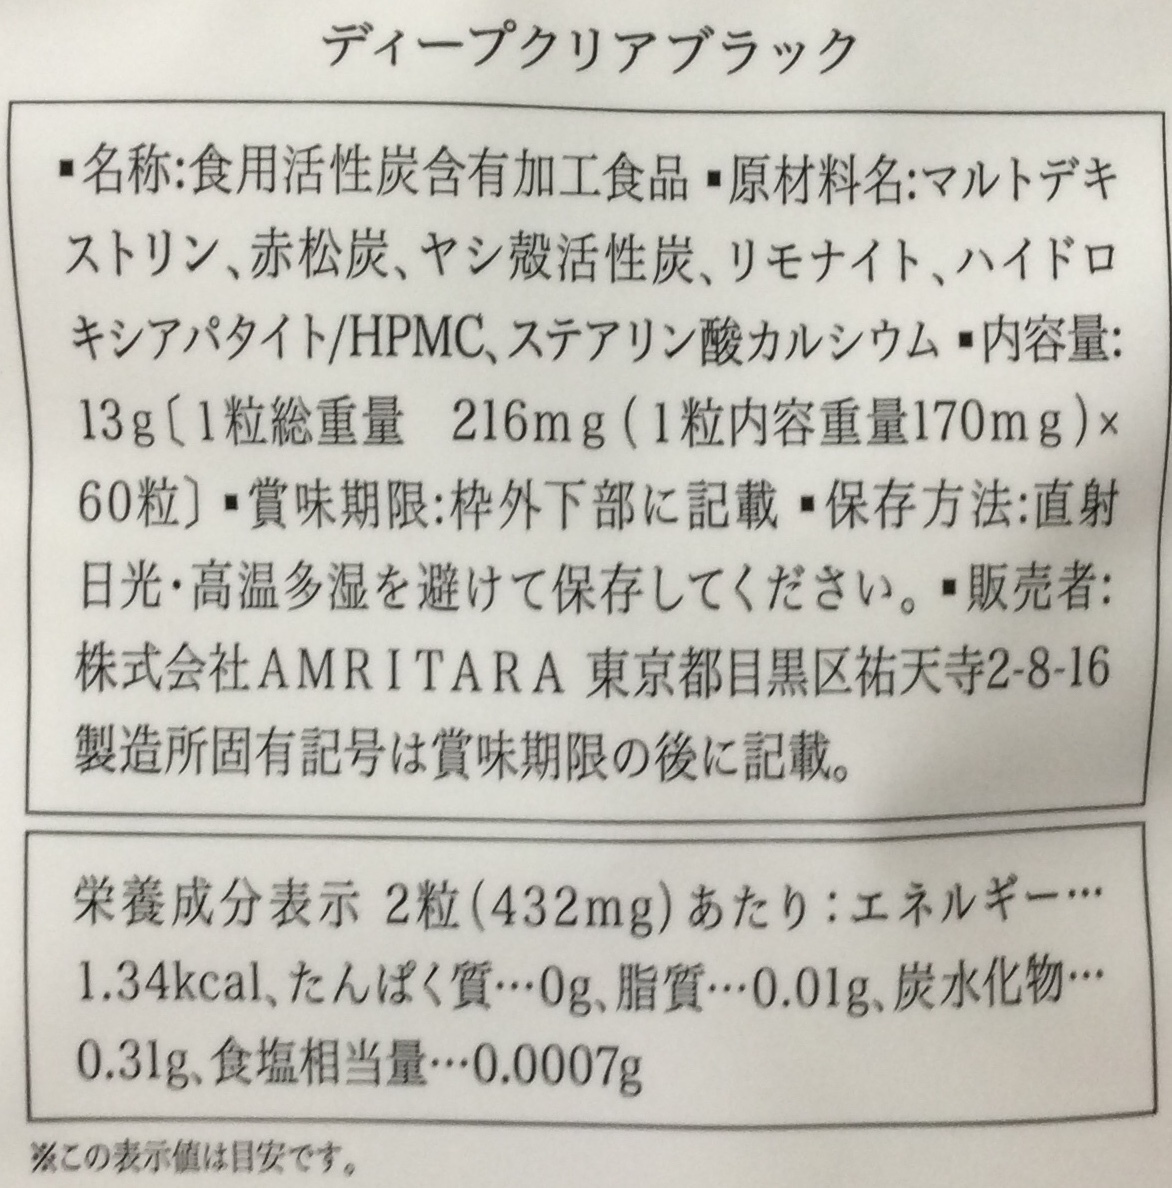 67DA0060-E9A2-4F50-BCF3-3C2DF0B16AD7.jpeg